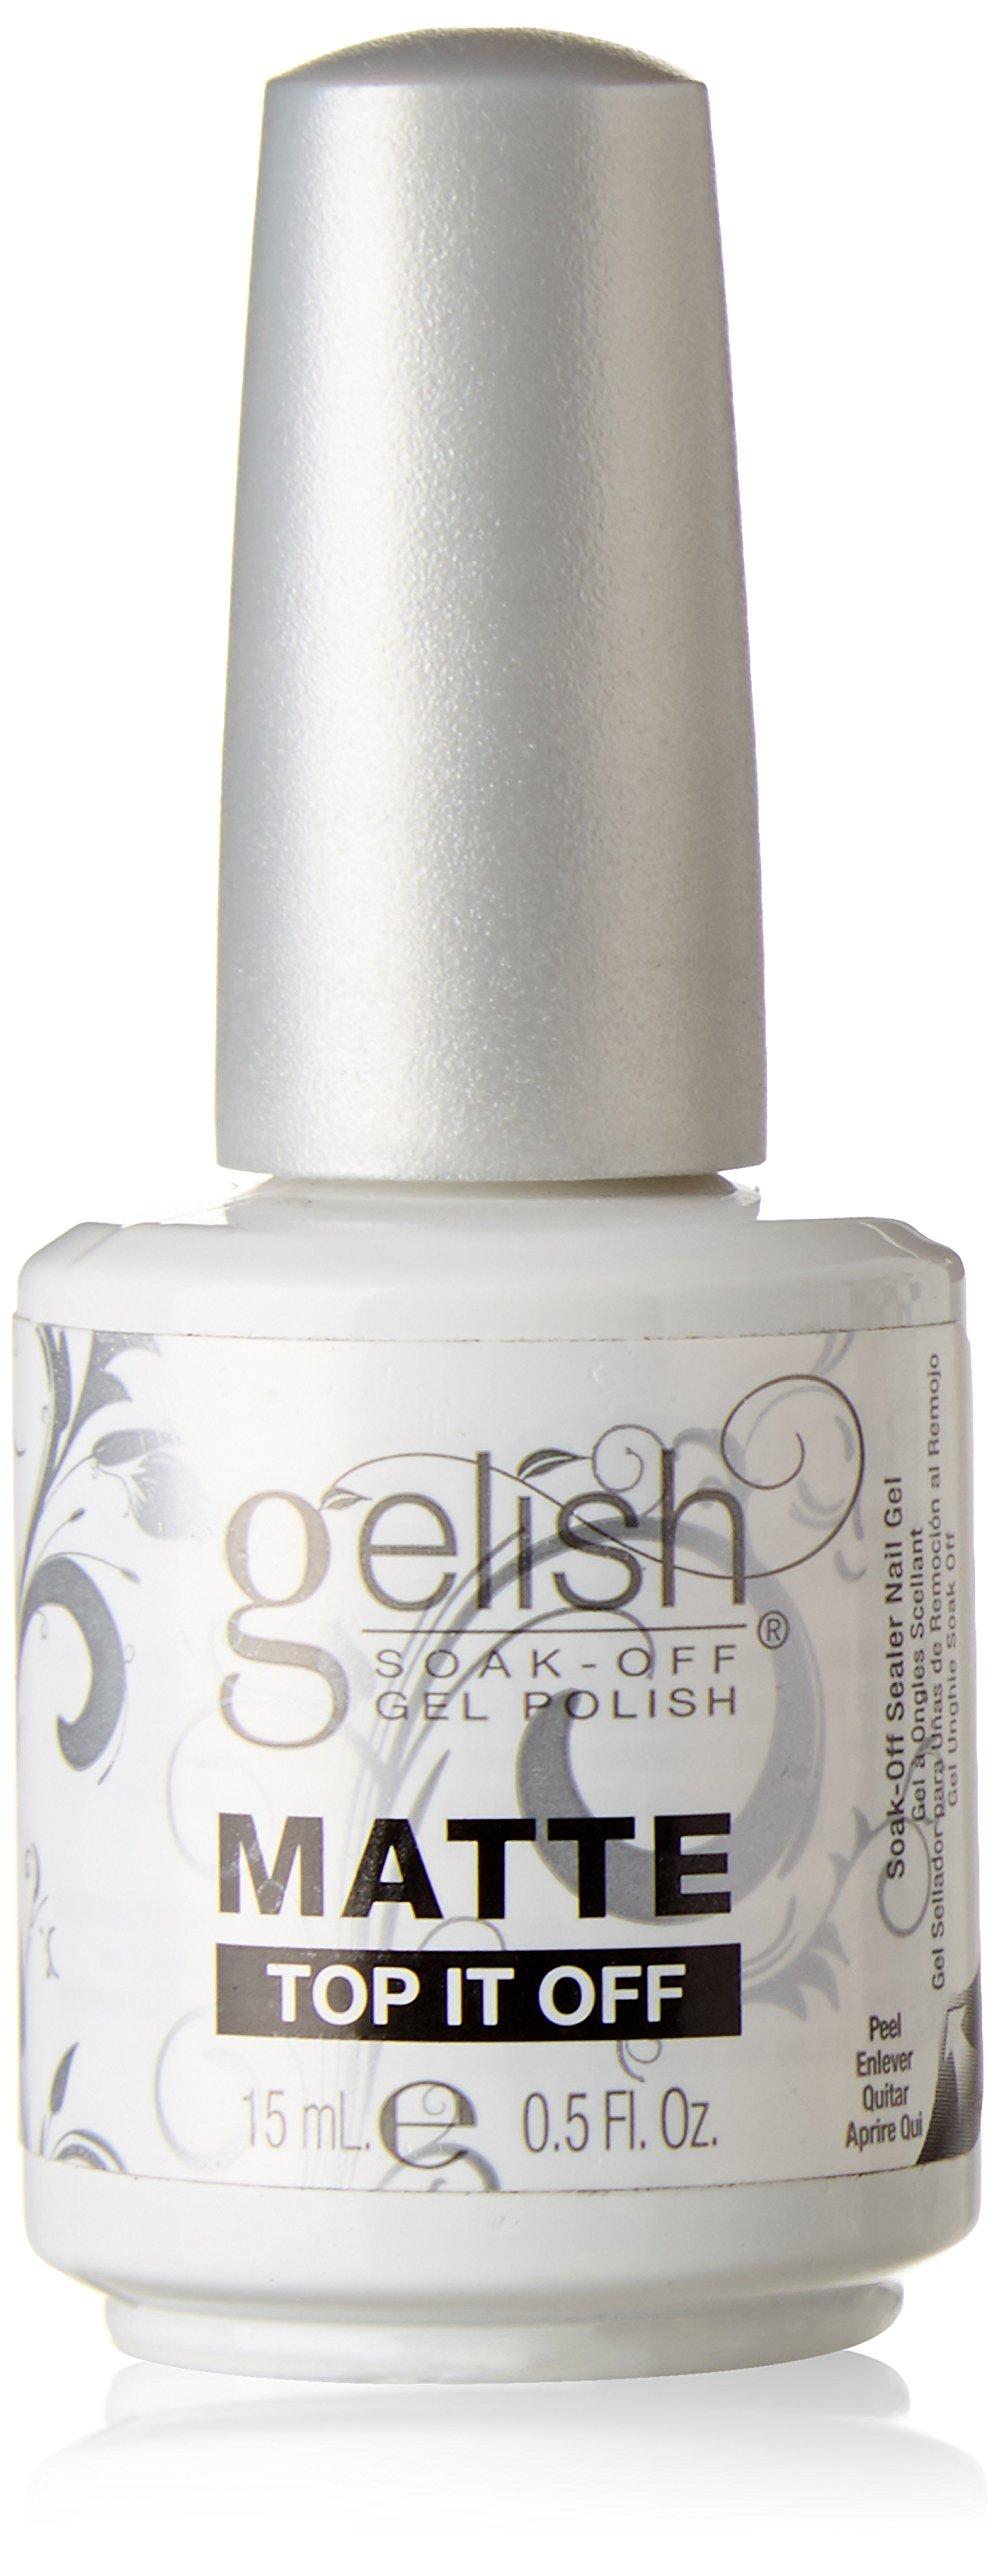 Gelish Soak Matte Top It Off Sealer Gel Nail Polish, 0.5 Ounce